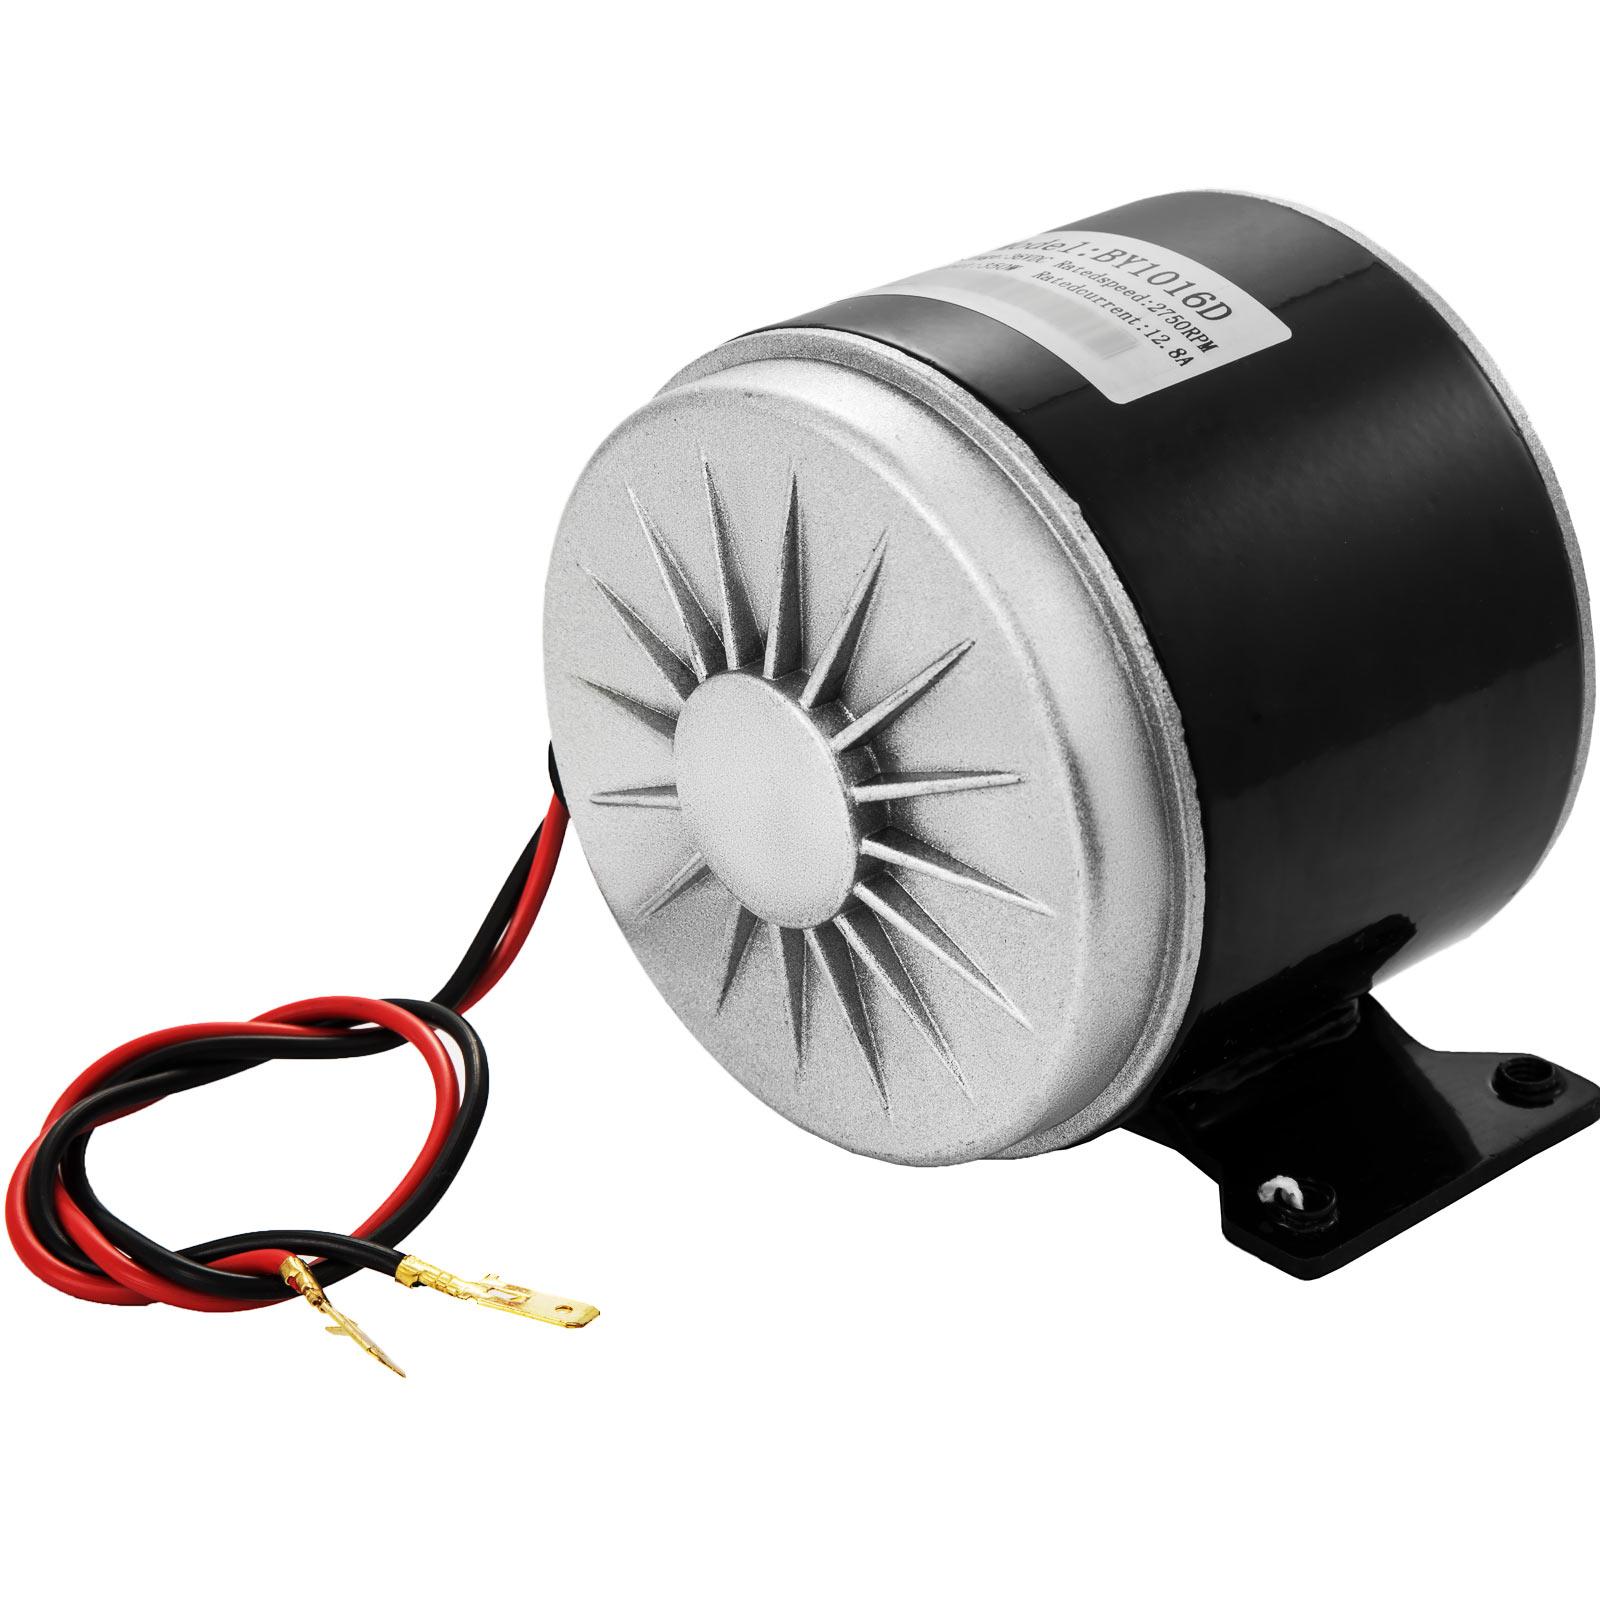 36v-Electric-Motor-controller-throttle-kit-f-Scooter-E-Scooter-ATV-Permanent thumbnail 24